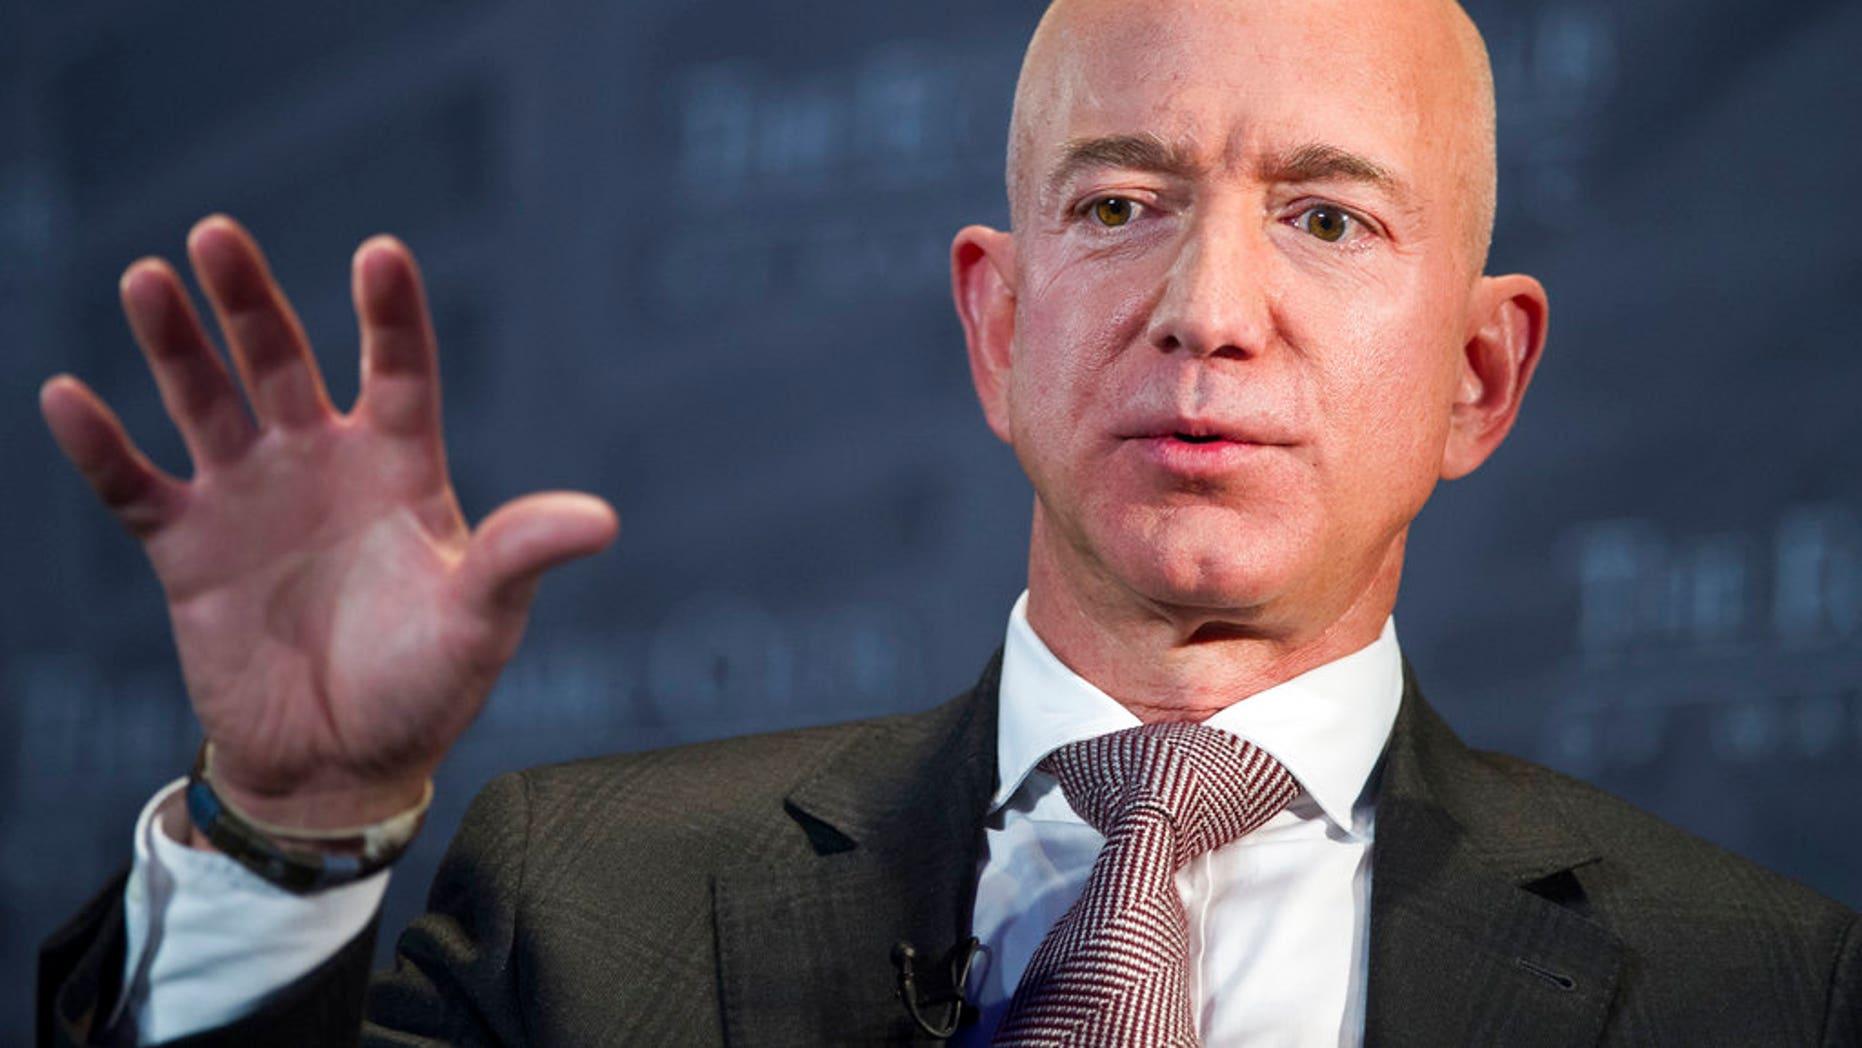 File photo: Jeff Bezos, Amazon founder and CEO, speaks at The Economic Club of Washington's Milestone Celebration in Washington.